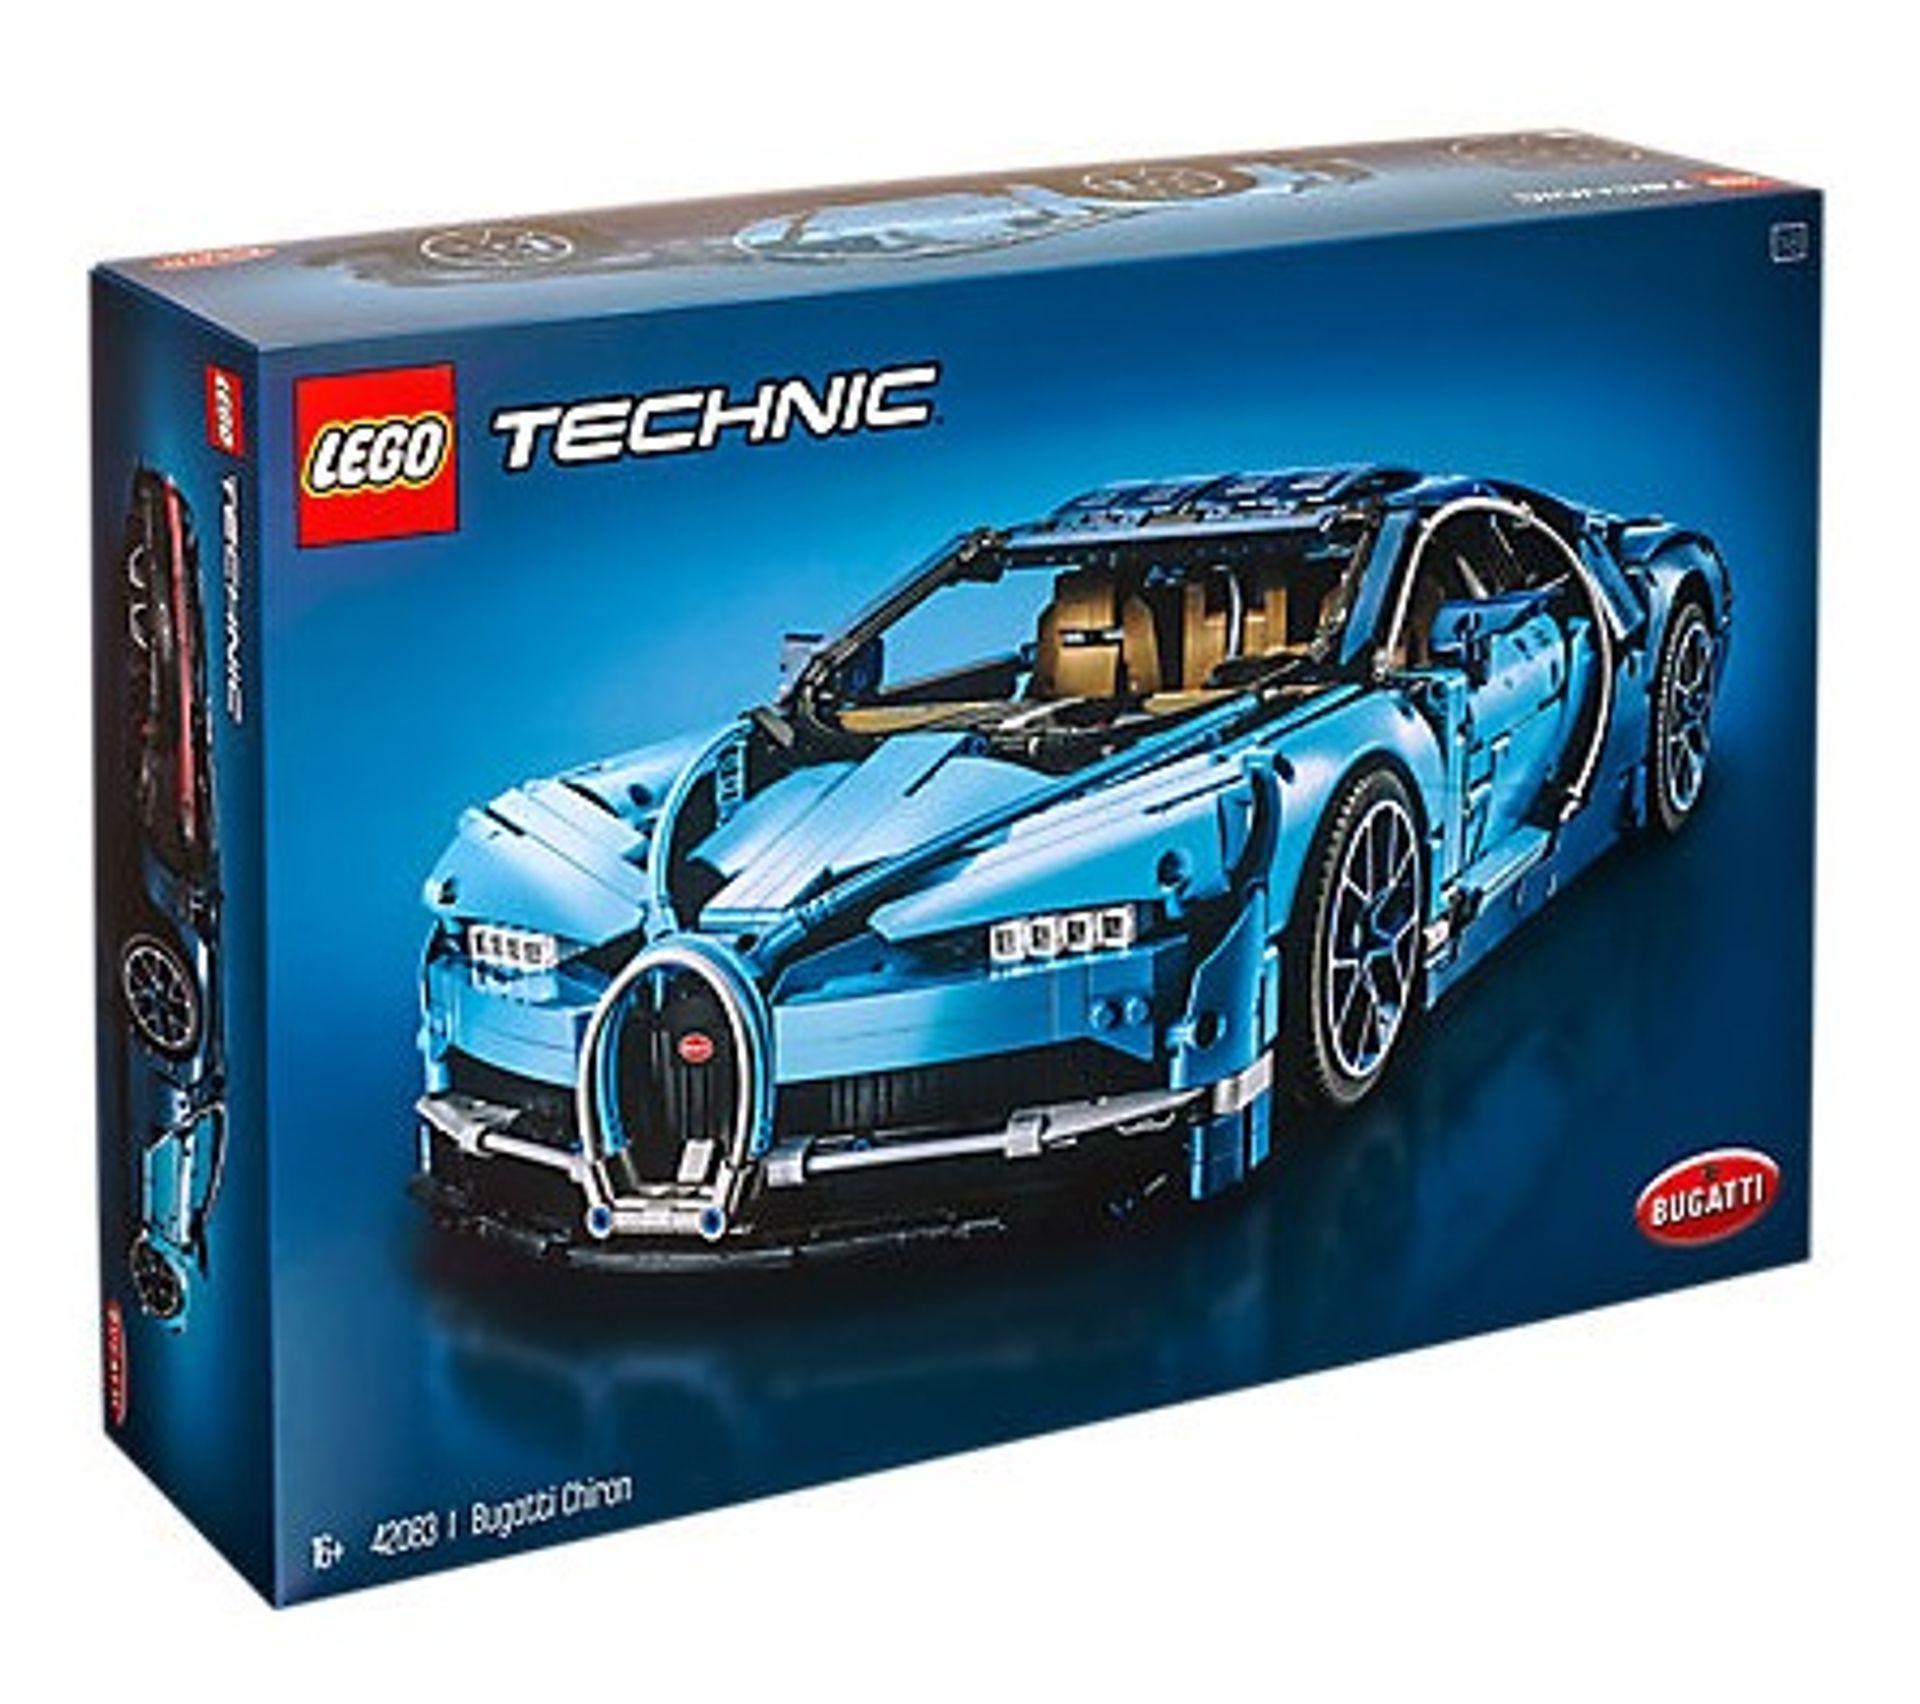 Jeux ChironLego construction Bugatti de rTechnic 42083 BUT erdCoQxBW